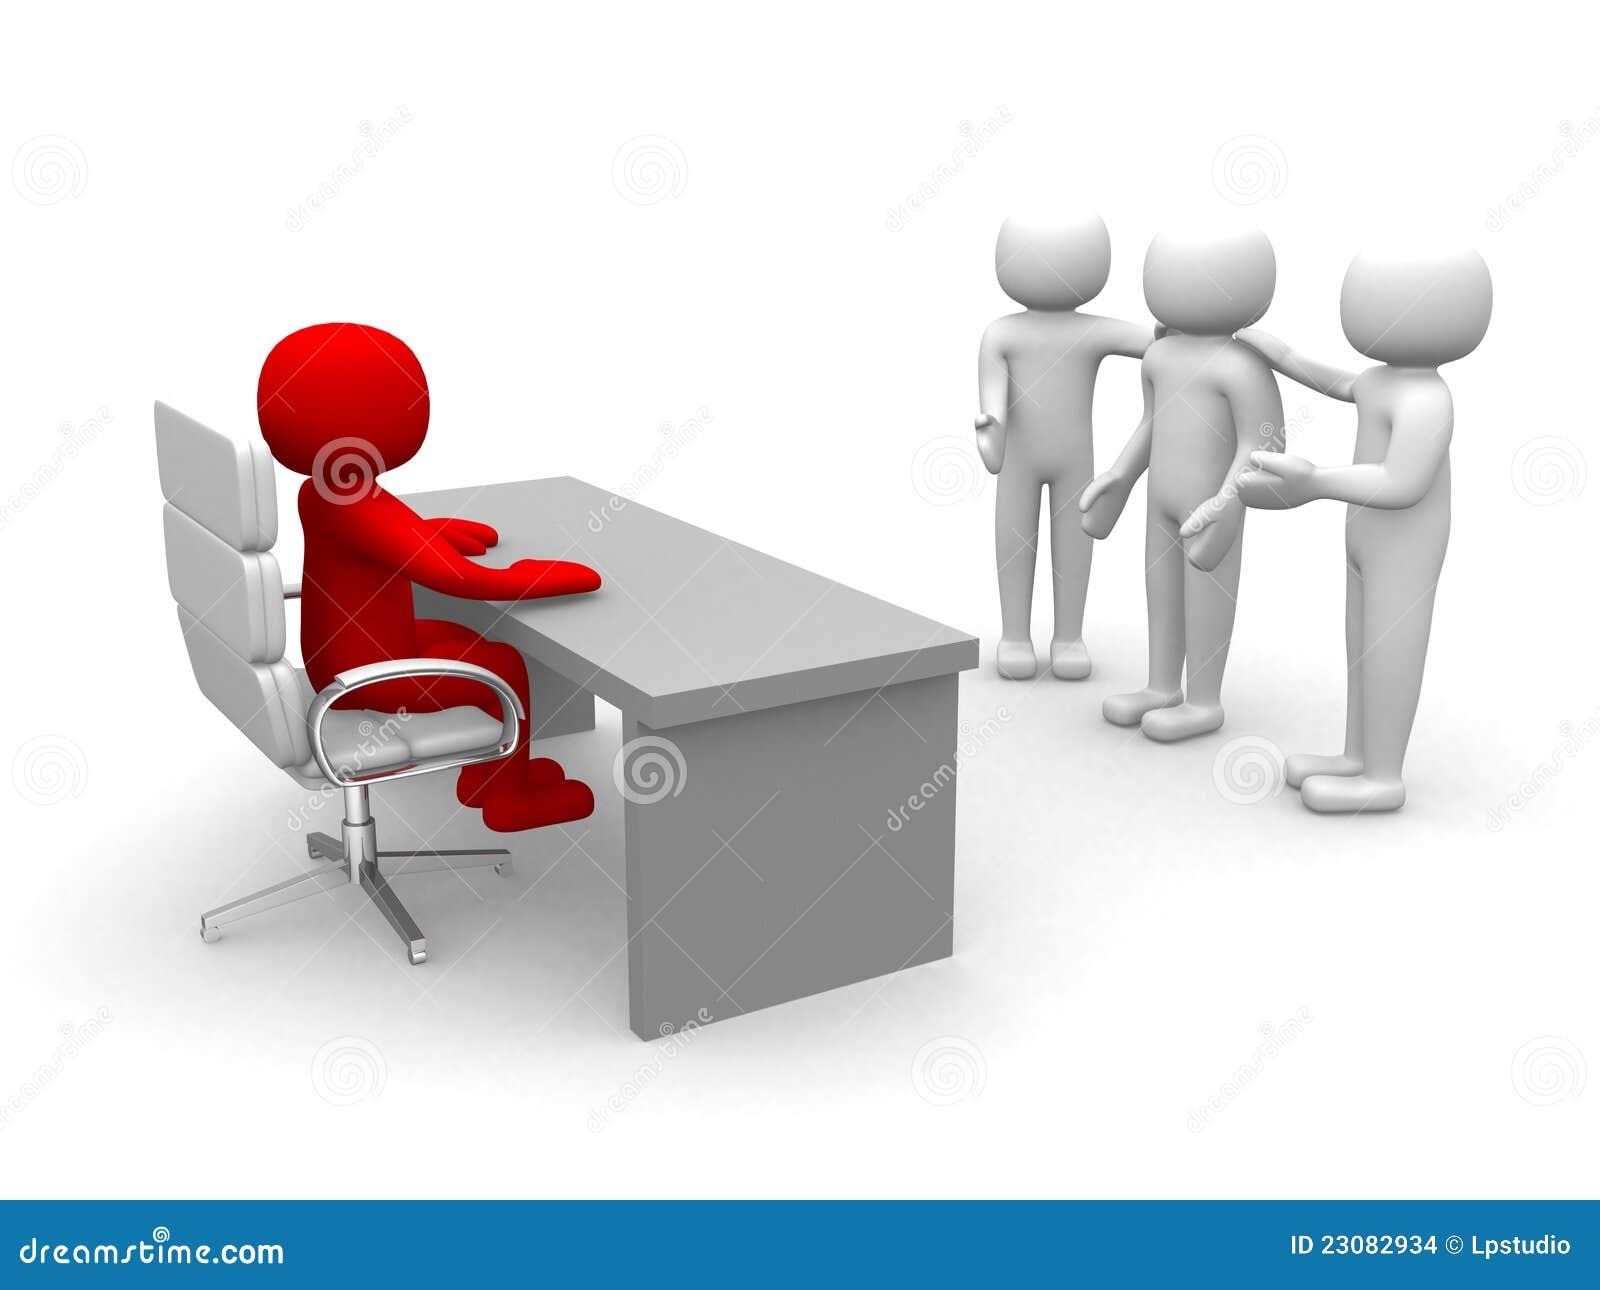 supervisor and employee romantic relationship studies